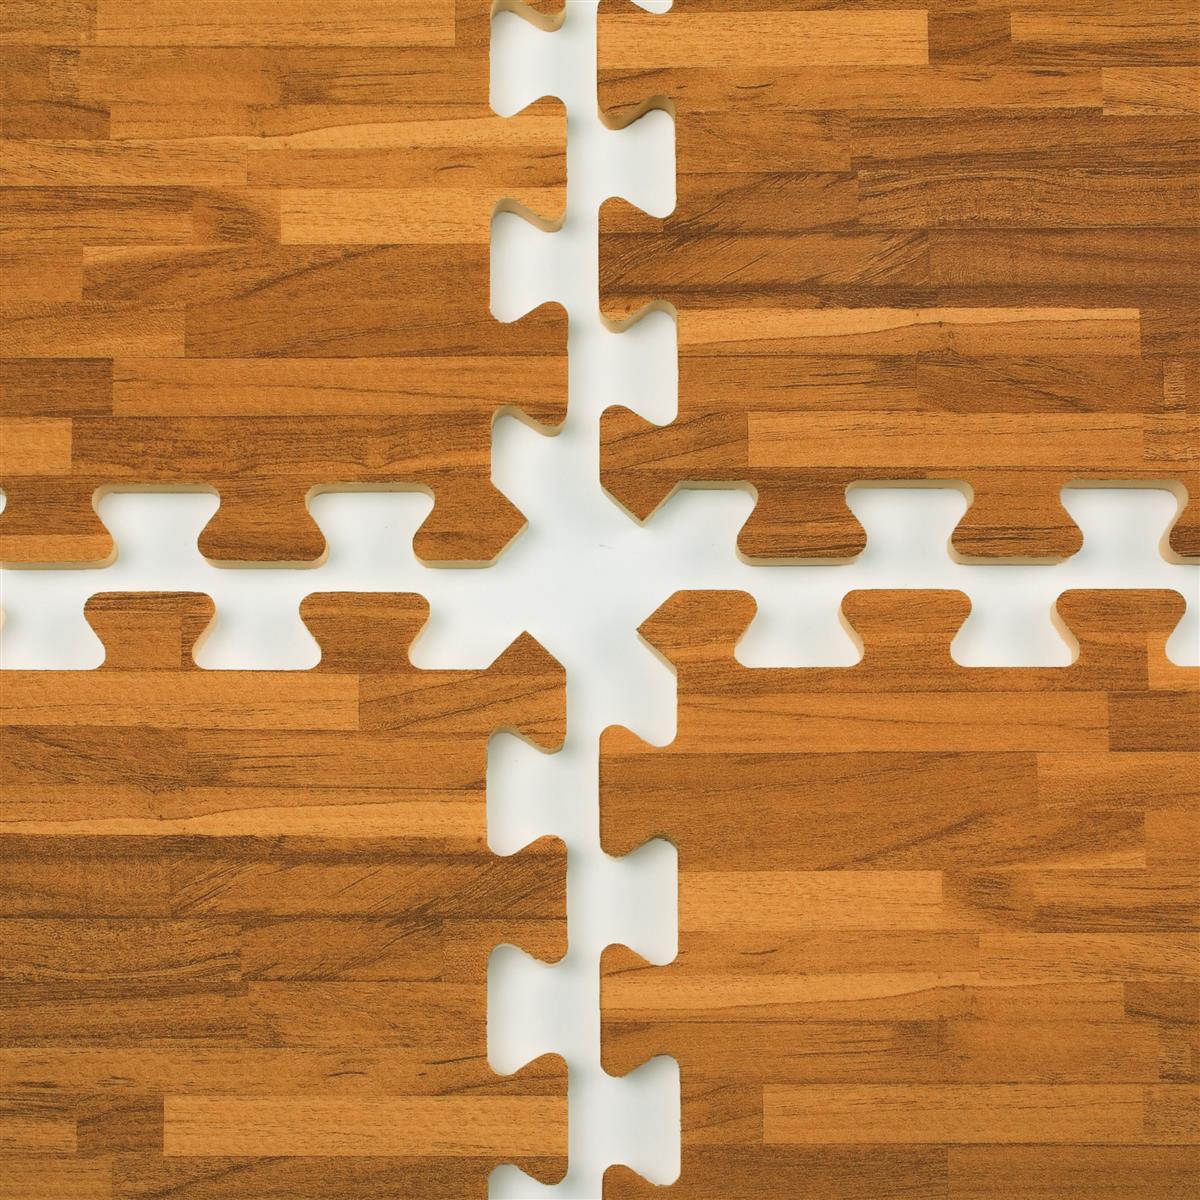 10 X Interlocking Floor Mats